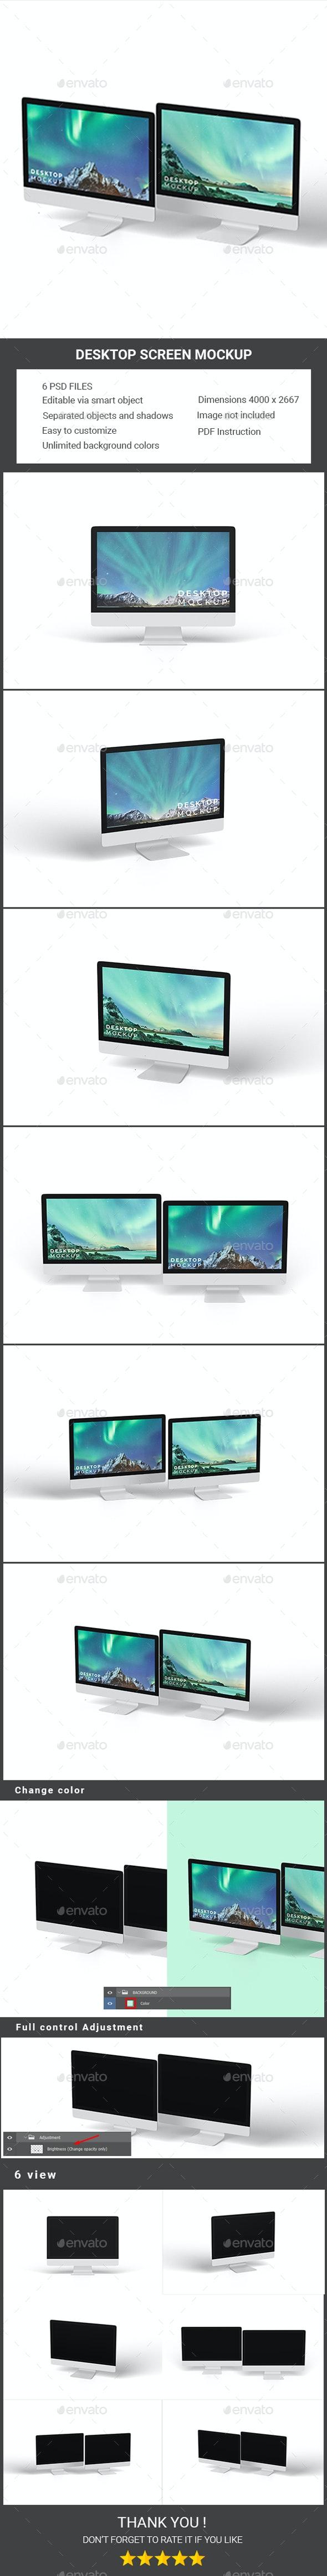 Desktop Screen Mockup - Displays Product Mock-Ups